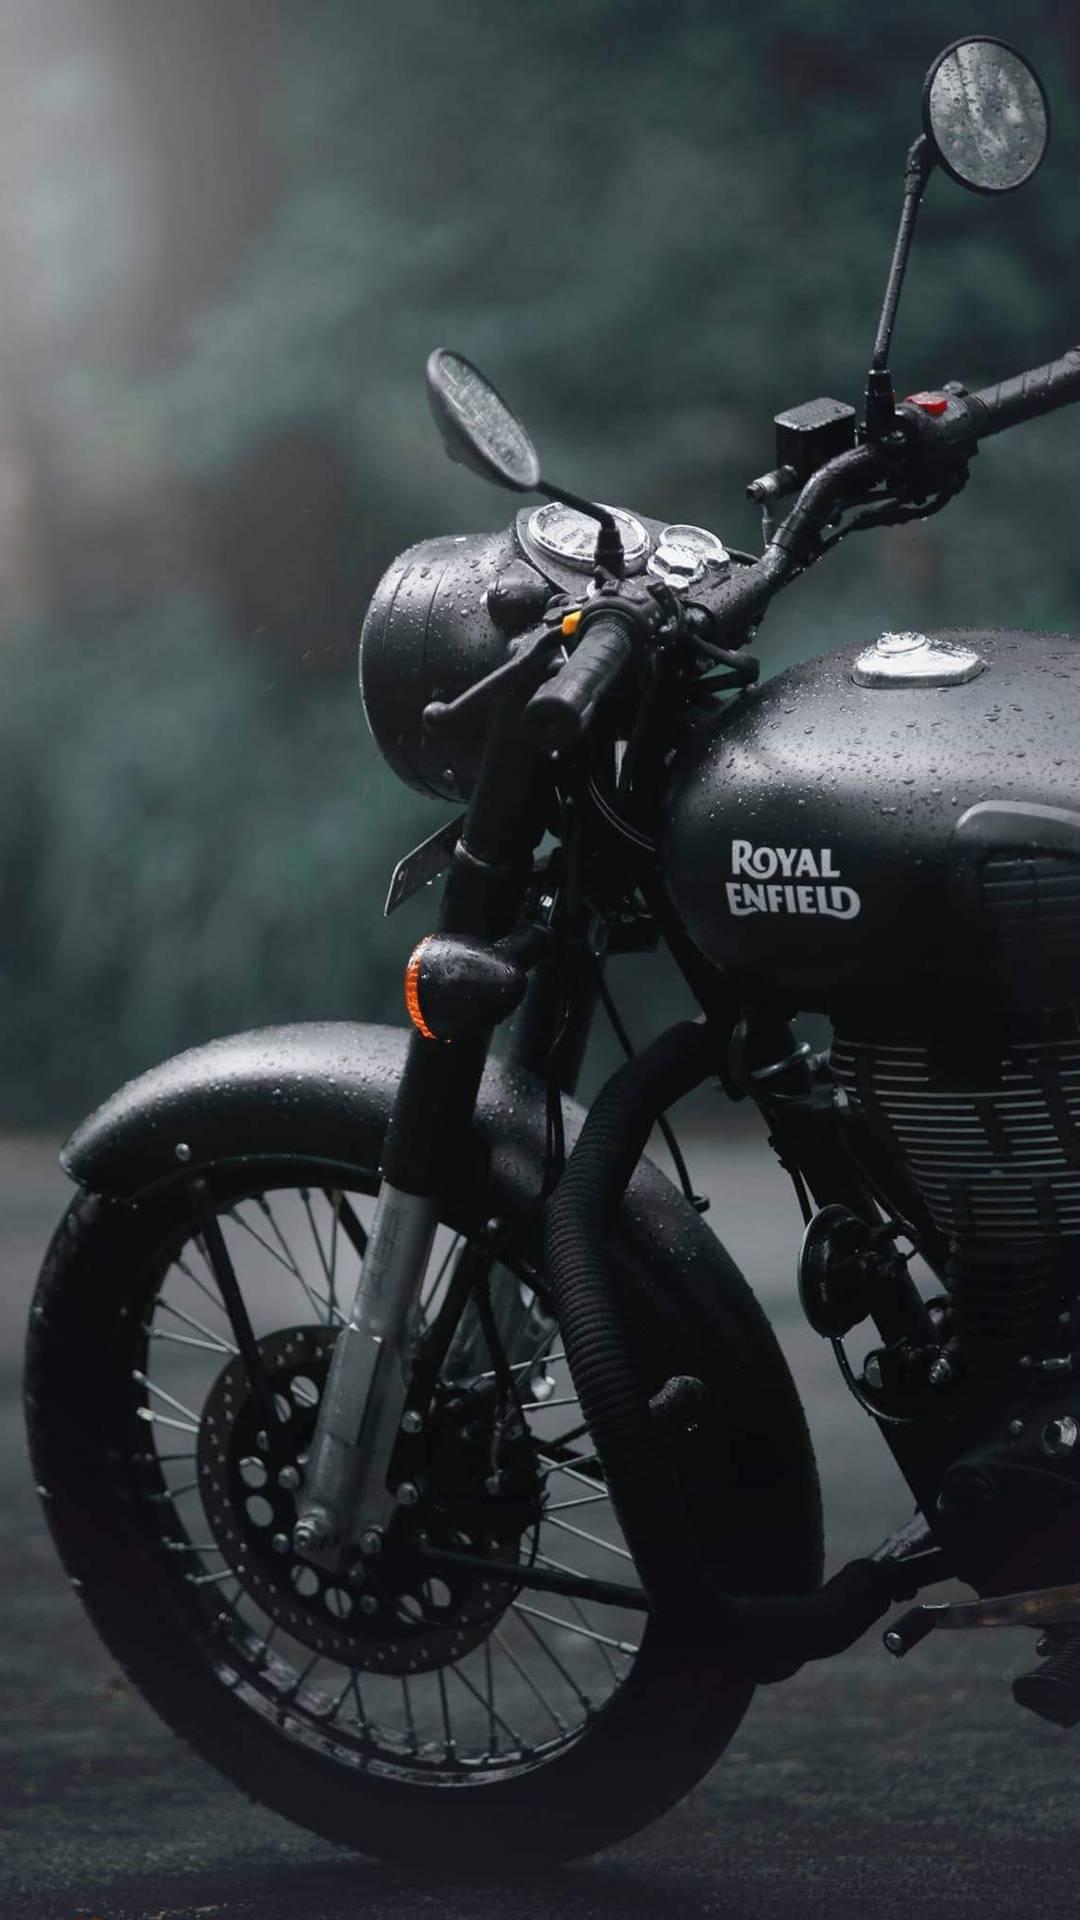 royal enfield bullet wallpaper,land vehicle,vehicle,motorcycle,motor vehicle,headlamp